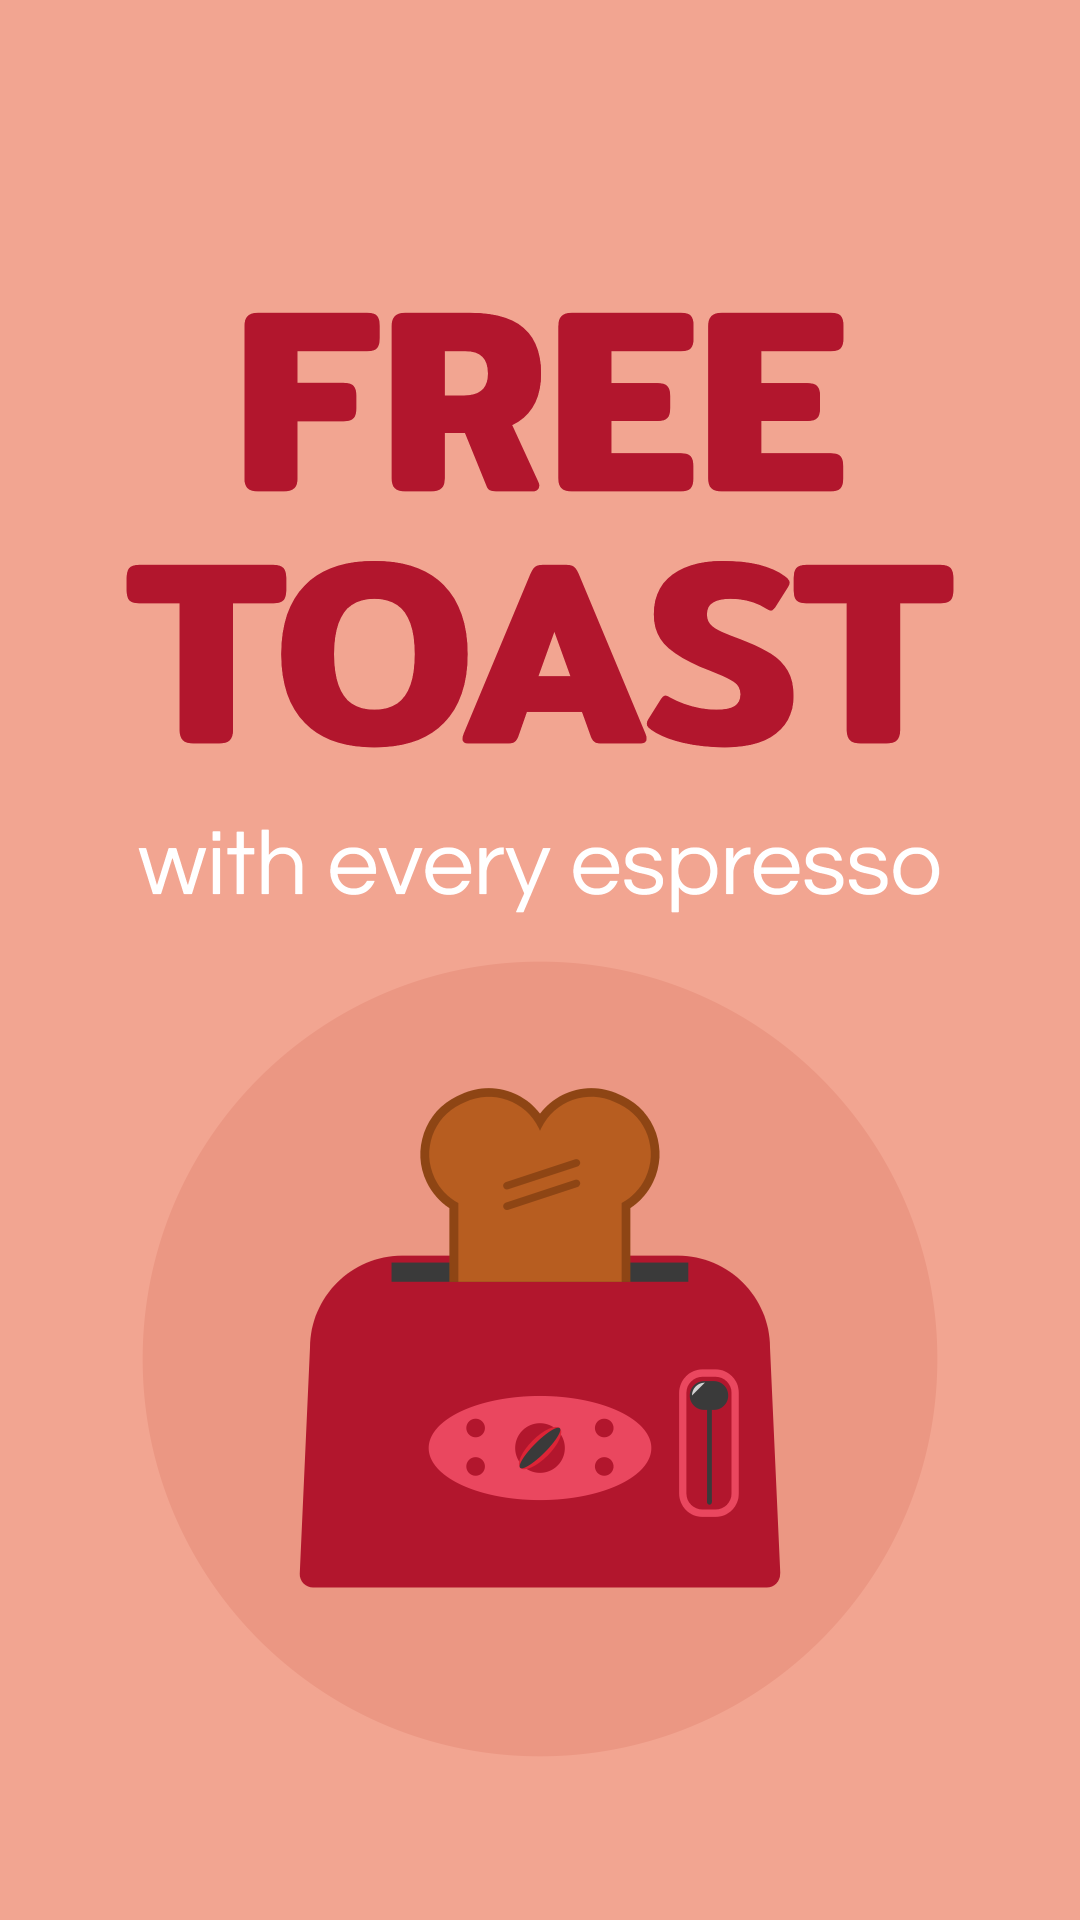 Free toast with every espresso